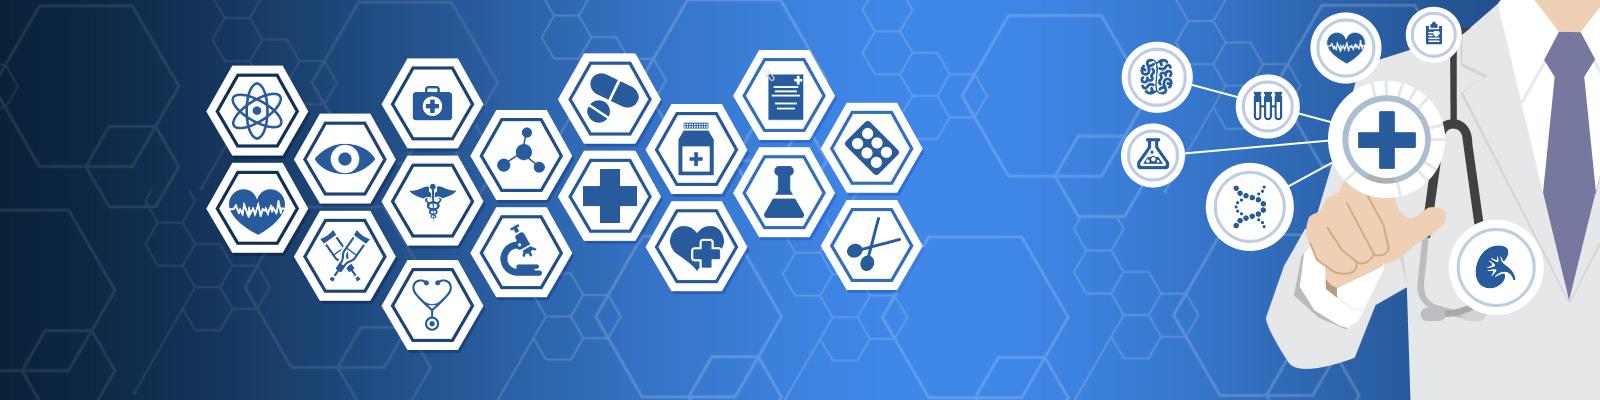 Orange County Healthcare Web Design, Medical, Life Science